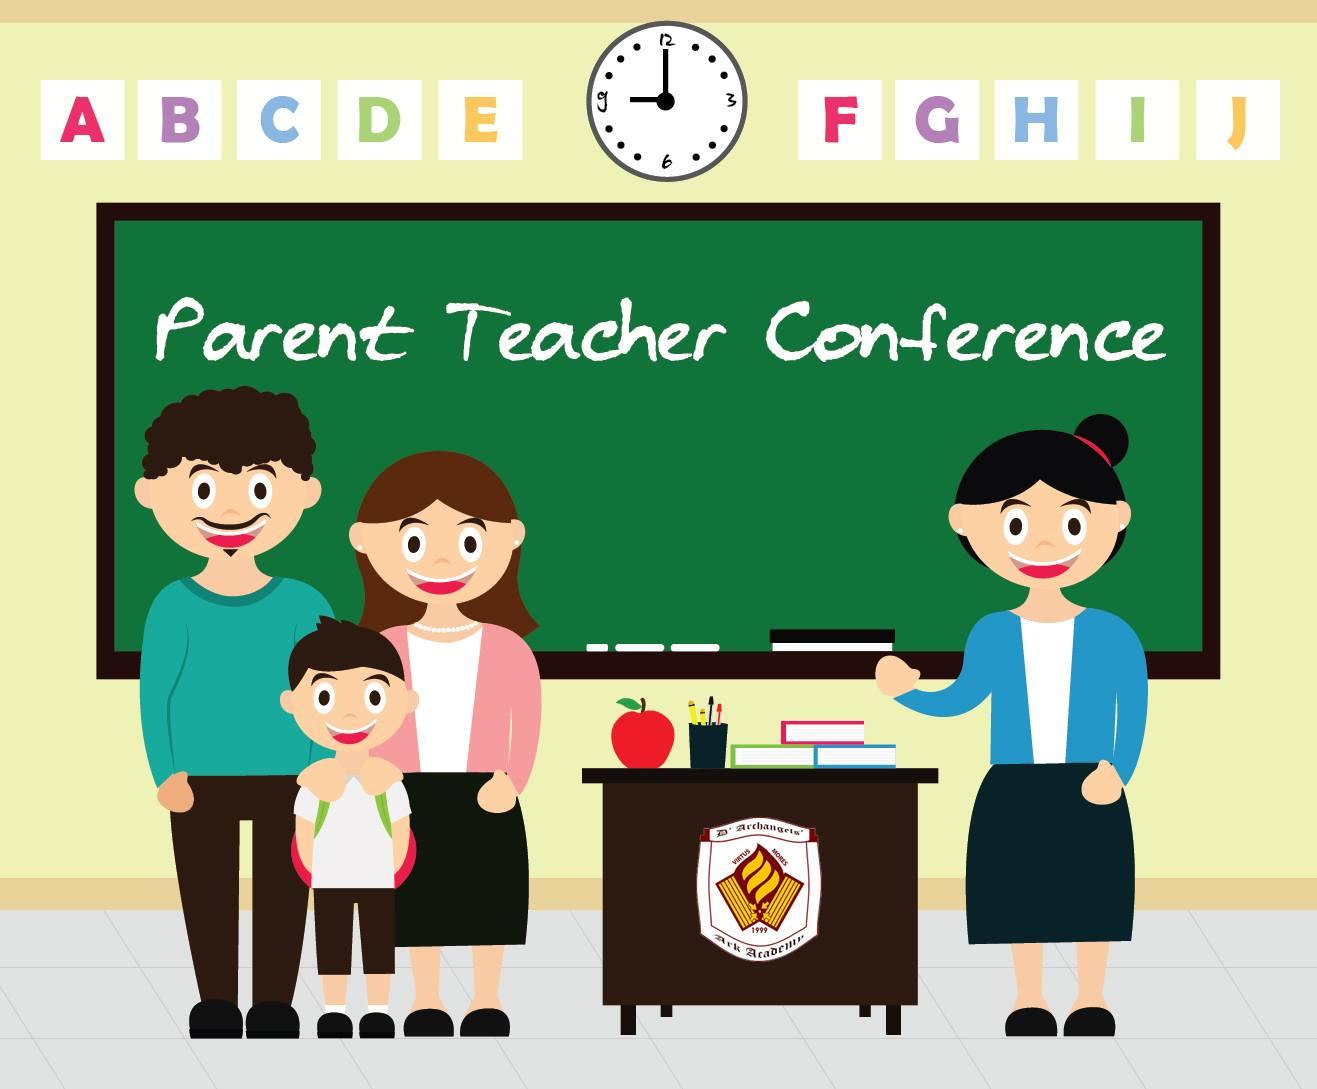 parent teacher interviews sunnyside school rh sunnysideschool ca parent teacher conference clipart images And Clip Teacher Black Conference Art White Parent